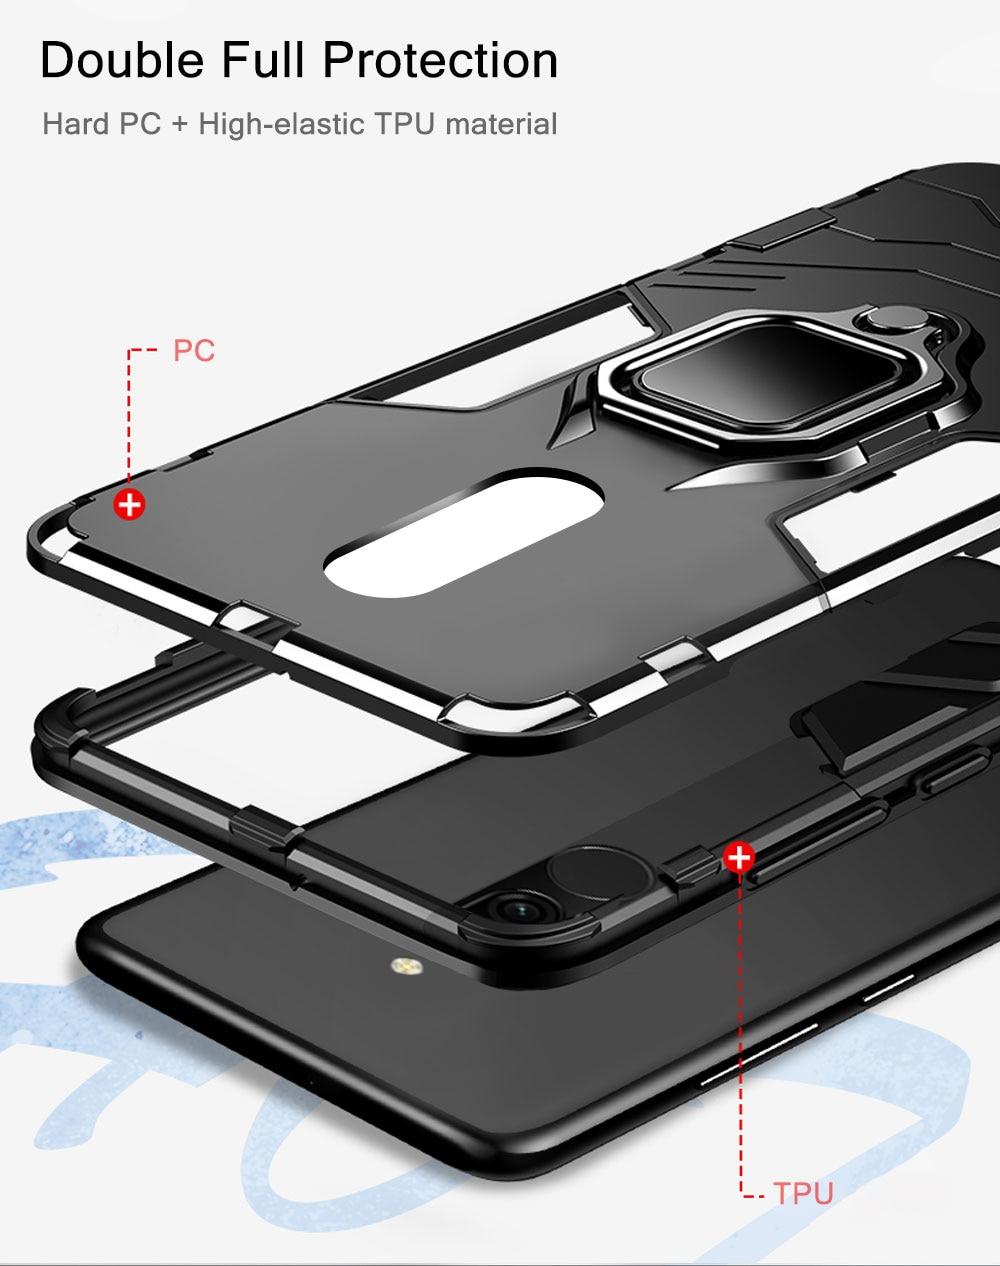 Hafdd2385fdc14d66905ac46652957f39V Armor Case for Redmi 8 8A Case Magnetic Car Phone Holder TPU+PC Bumper Cover on for Xiaomi Redmi 8 8A 8 A Global Version Case